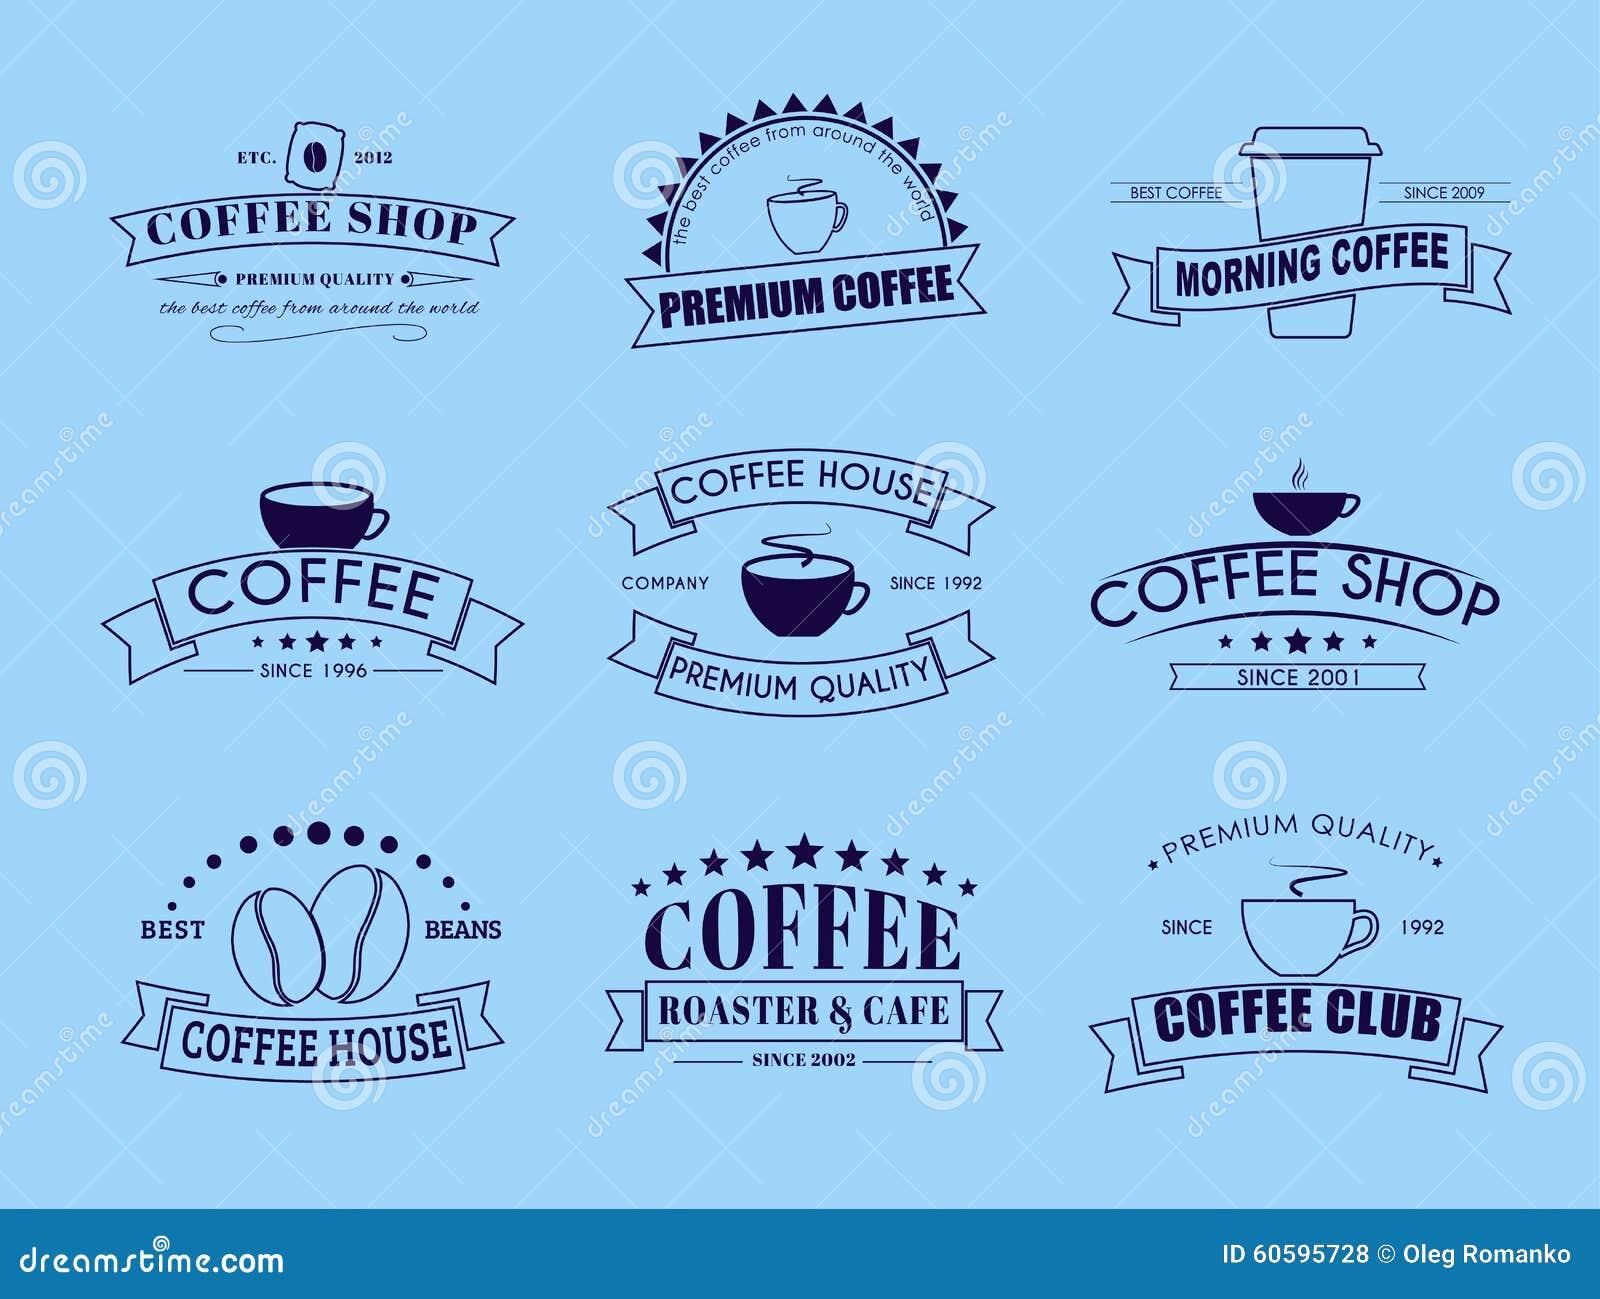 Art logo logo s coffee logo coffee shop coffee design shop logo coffee - Blue Coffee Design Illustration Logo